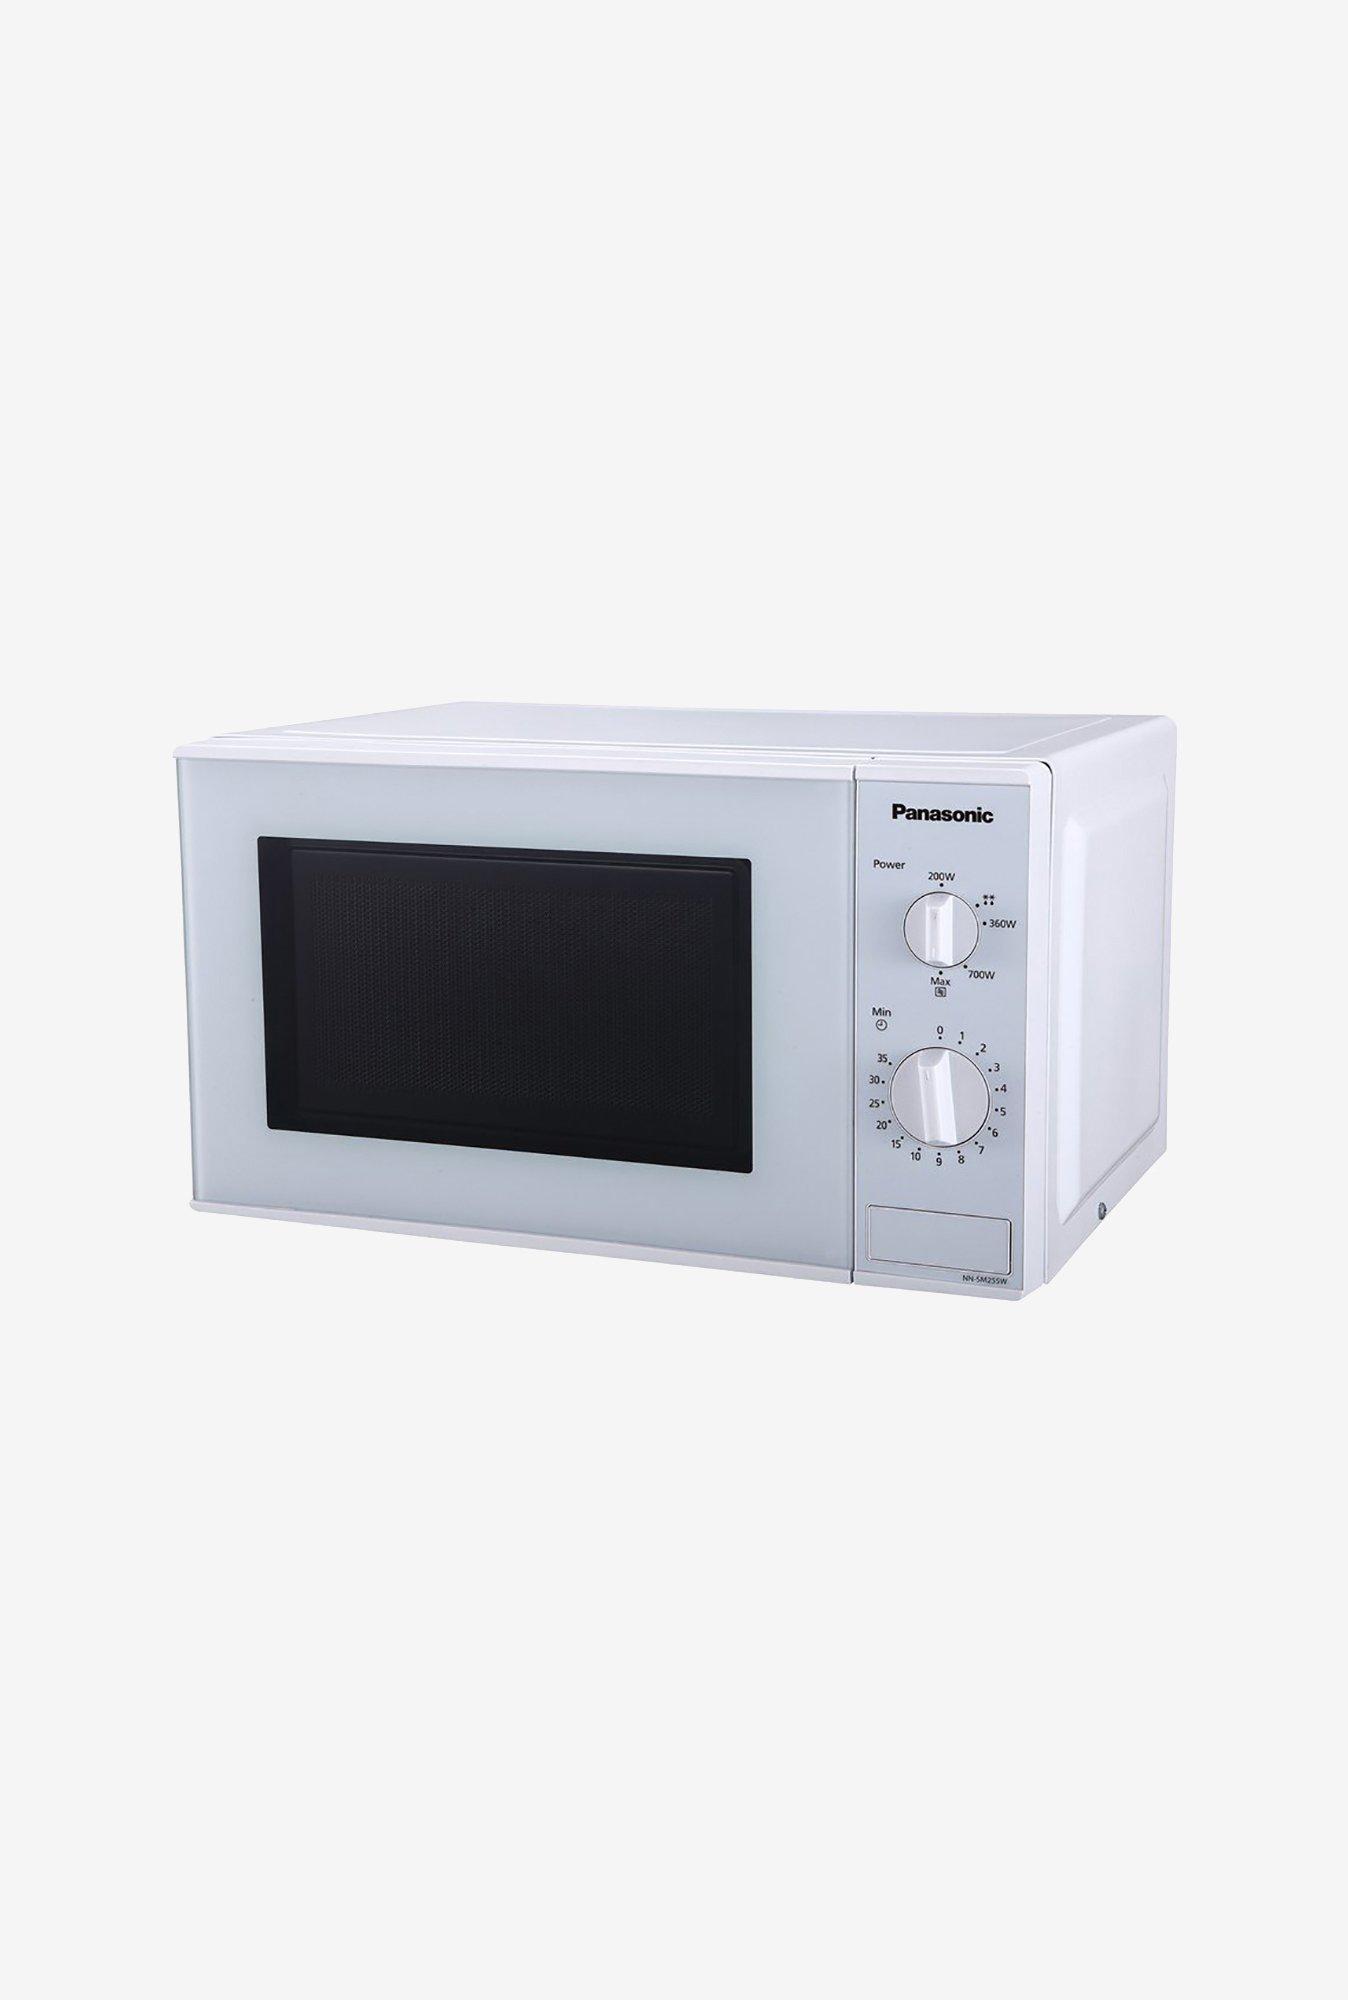 panasonic nn sm255wfdg 20l solo microwave oven white